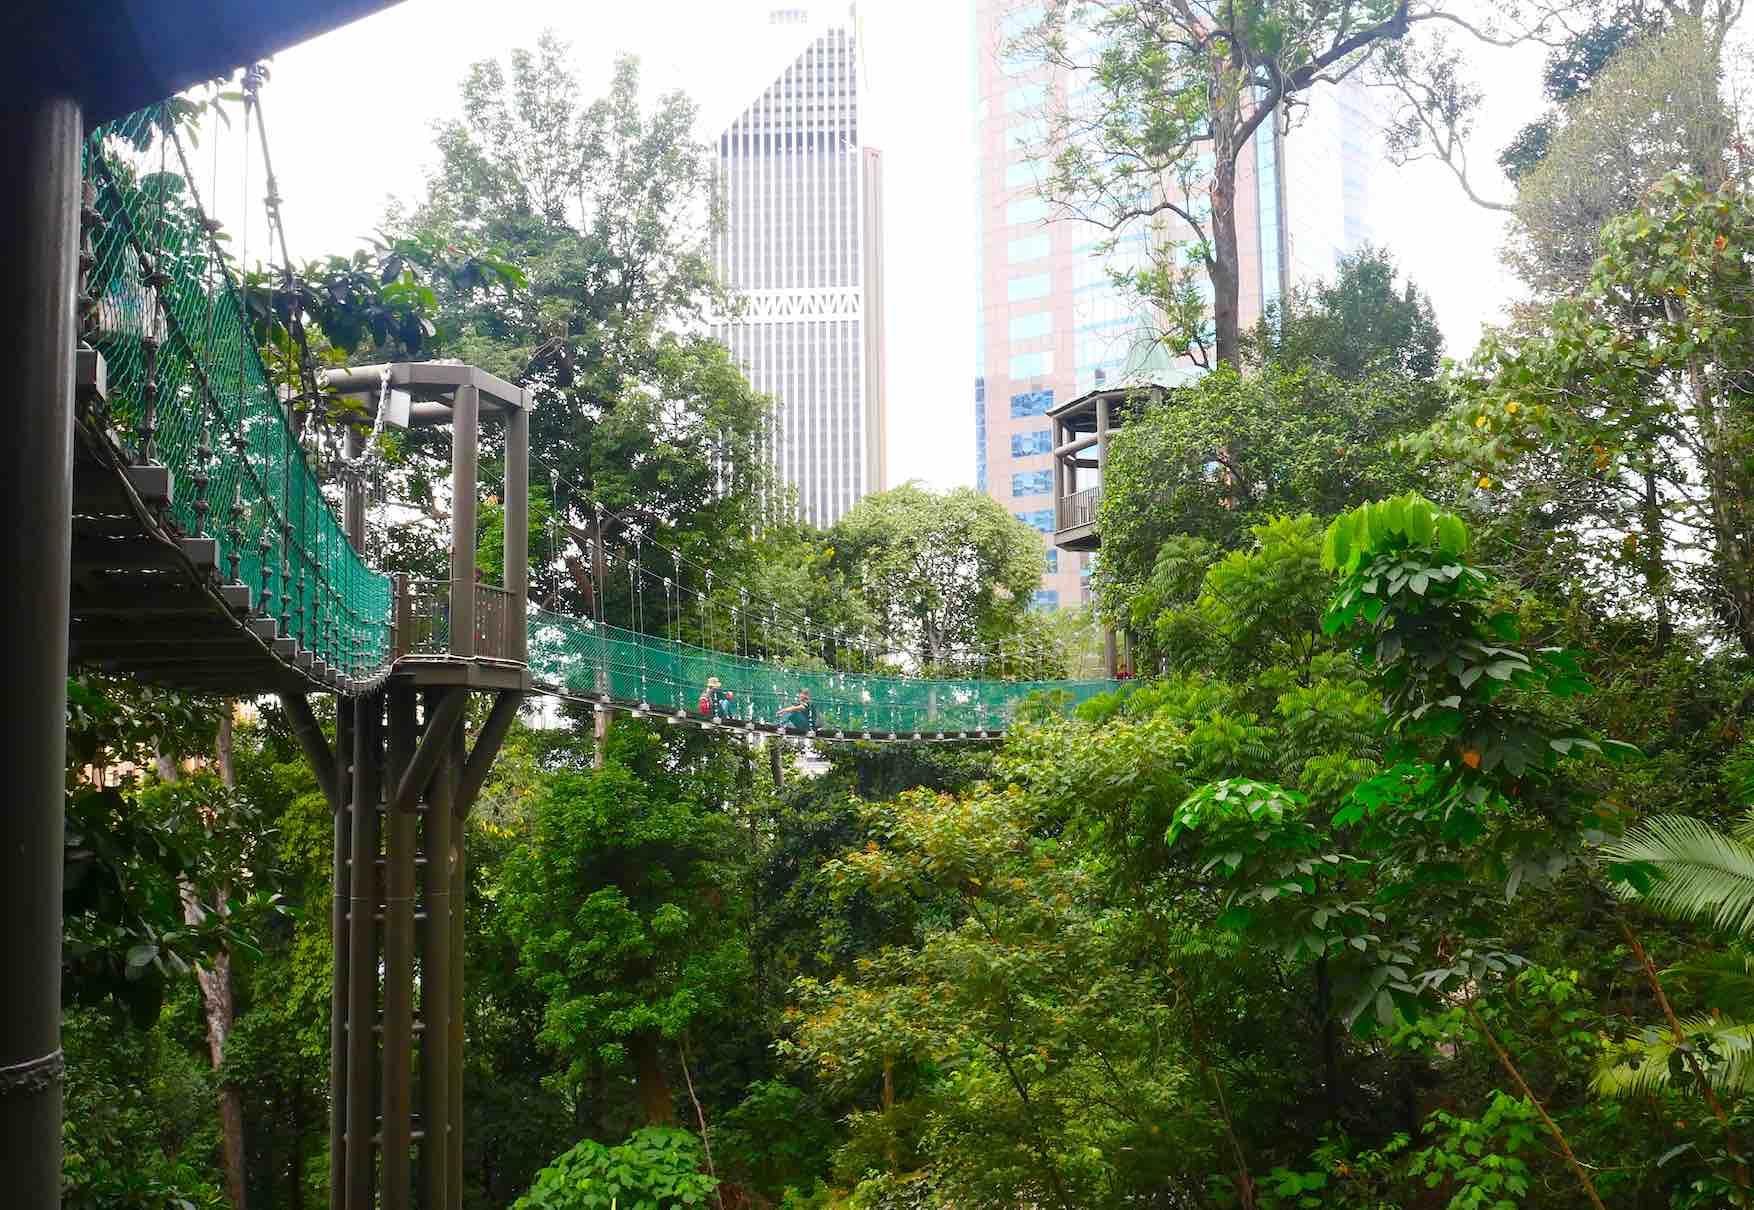 kuala-lumpur-canopy-walk-up-bukit-nanas-aspirantsg